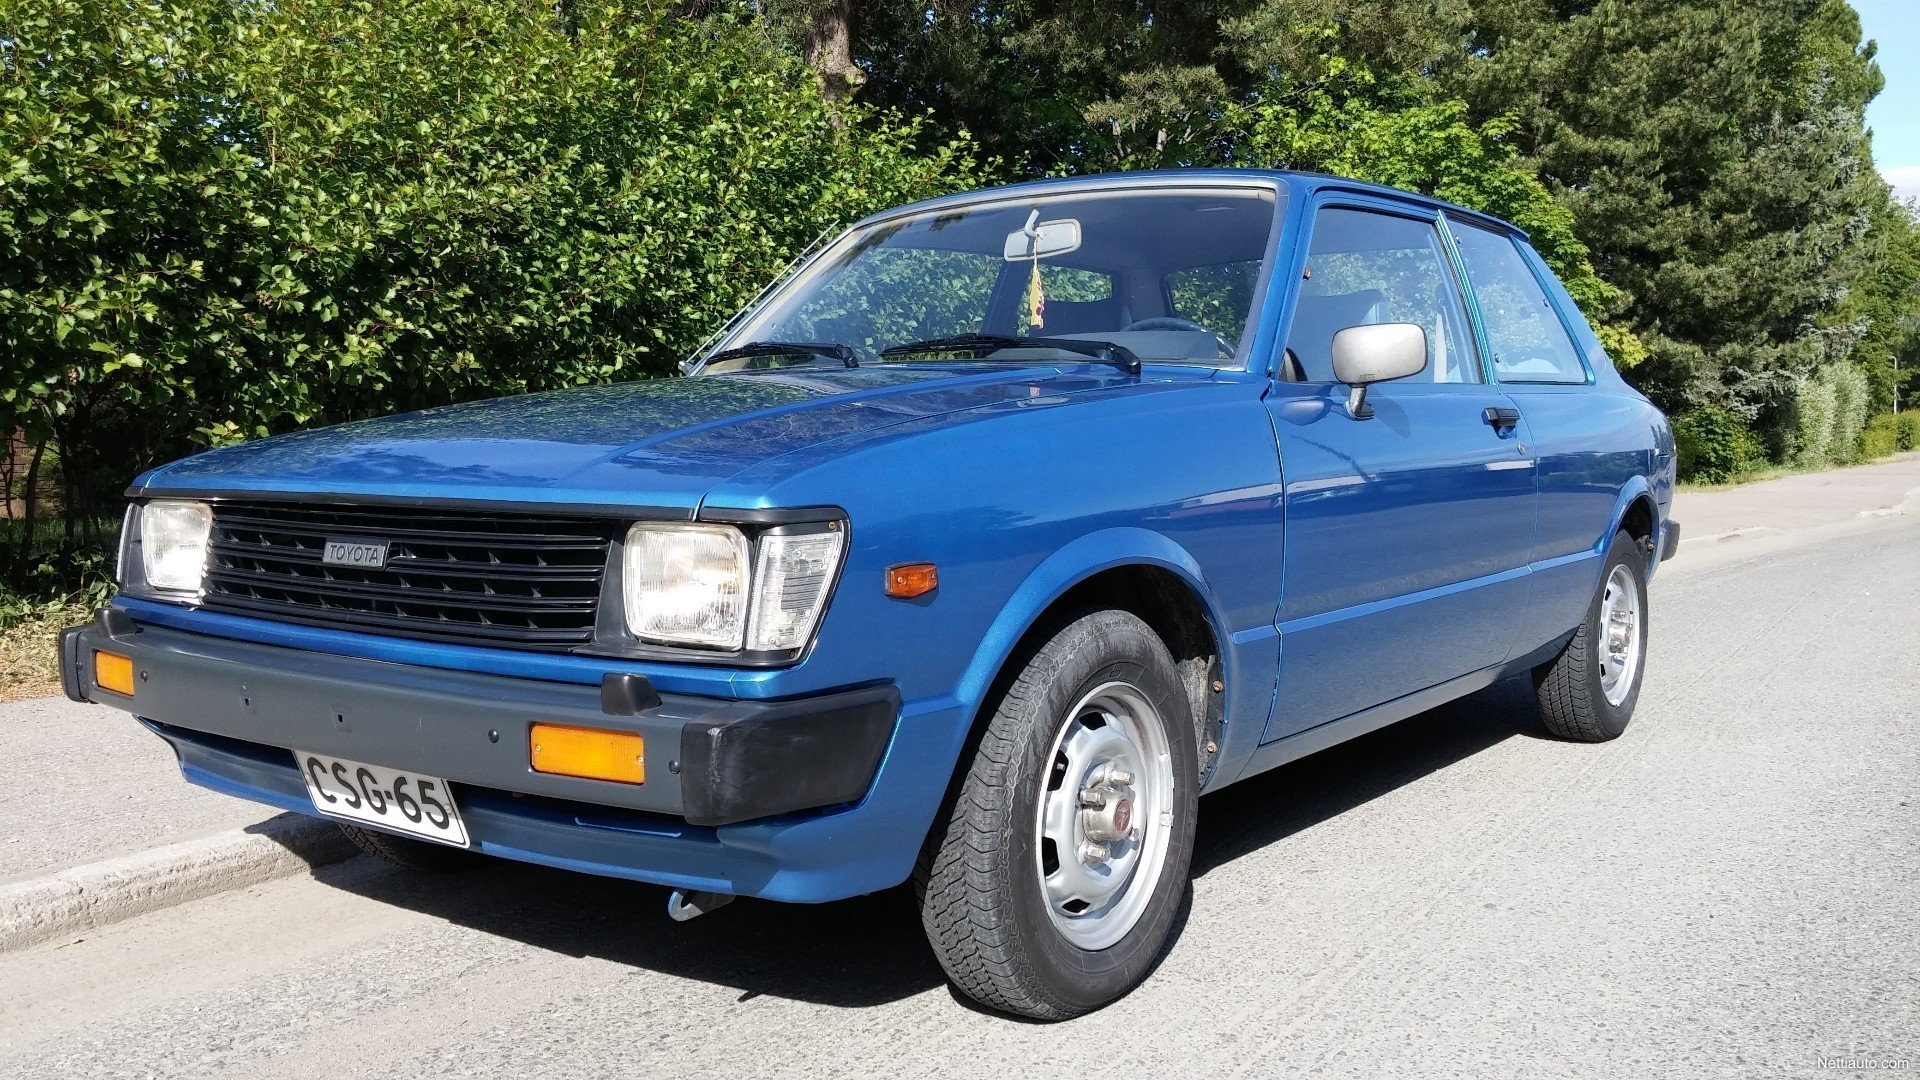 Toyota Tercel 13 Dx 2d Sedan 1981 Used Vehicle Nettiauto 1990 Hatchback Add To Compare Enlarge Image